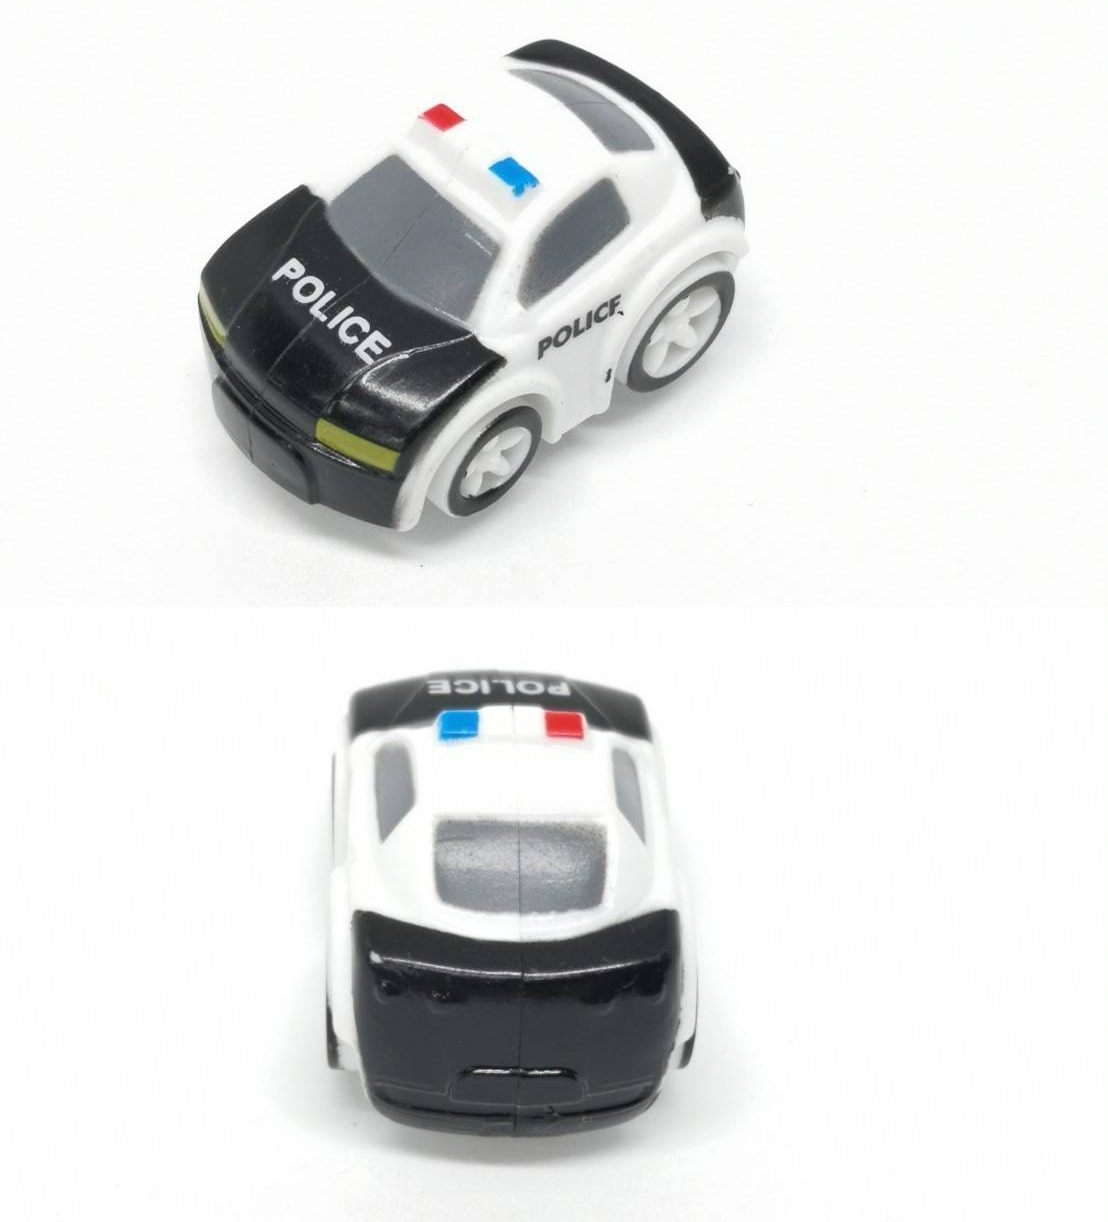 Justice Police Mini Car - Angle